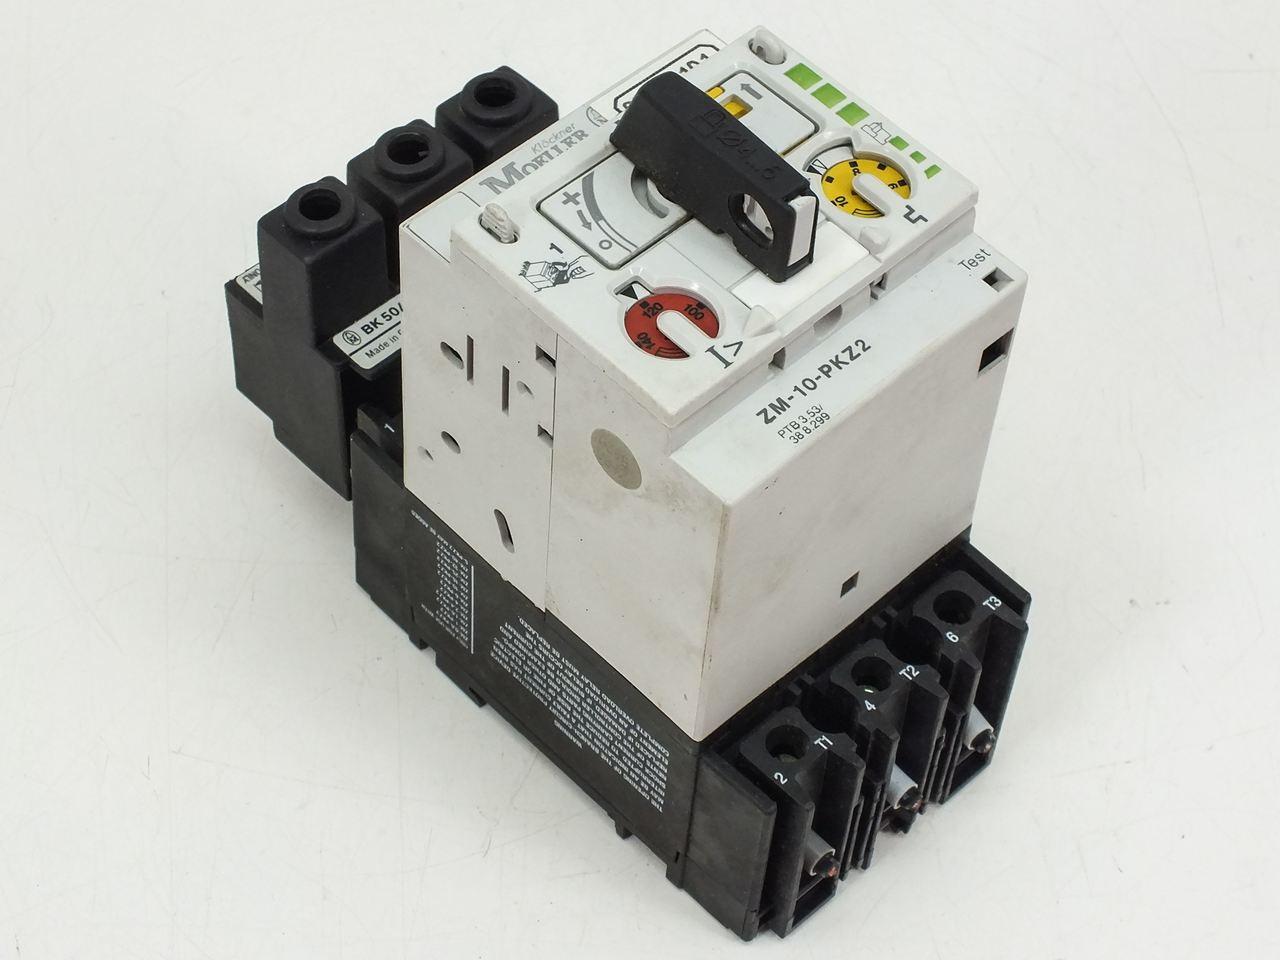 eaton moeller motory starter relay zm 10 pkz2 1.40__20187.1490041836?c=2 moeller pkz 2 control panel wiring diagram moeller wiring  at soozxer.org